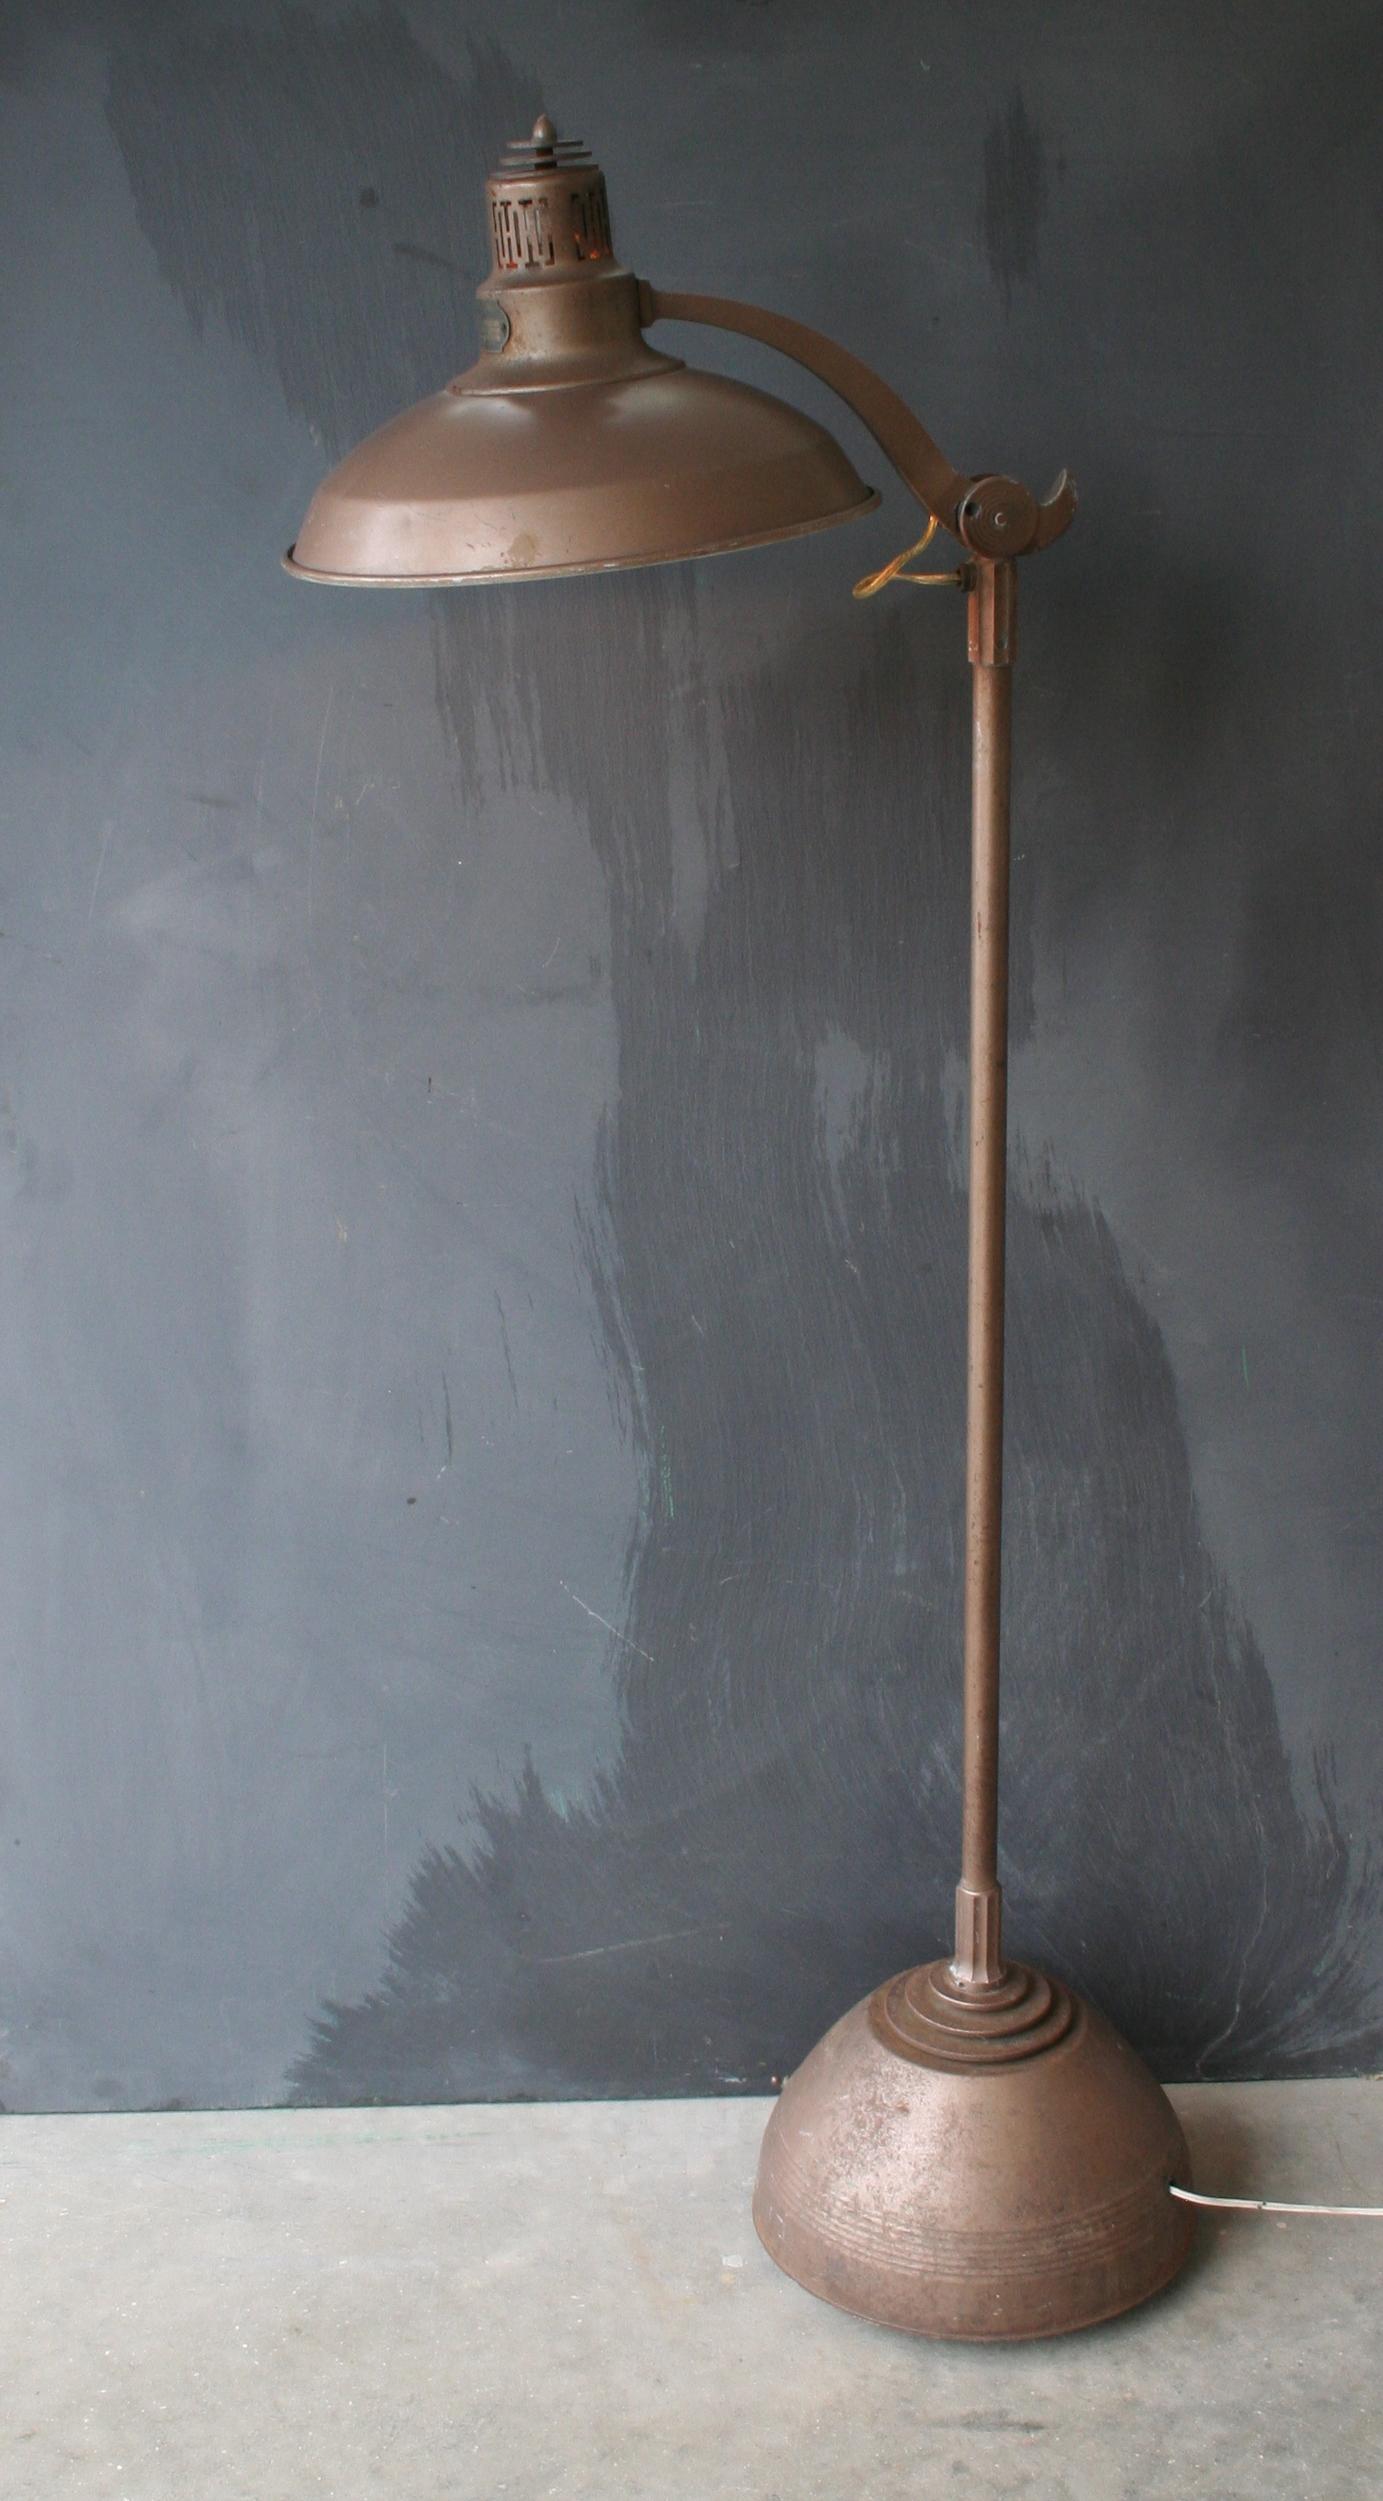 general electric sun lamp ramona morningbird. Black Bedroom Furniture Sets. Home Design Ideas